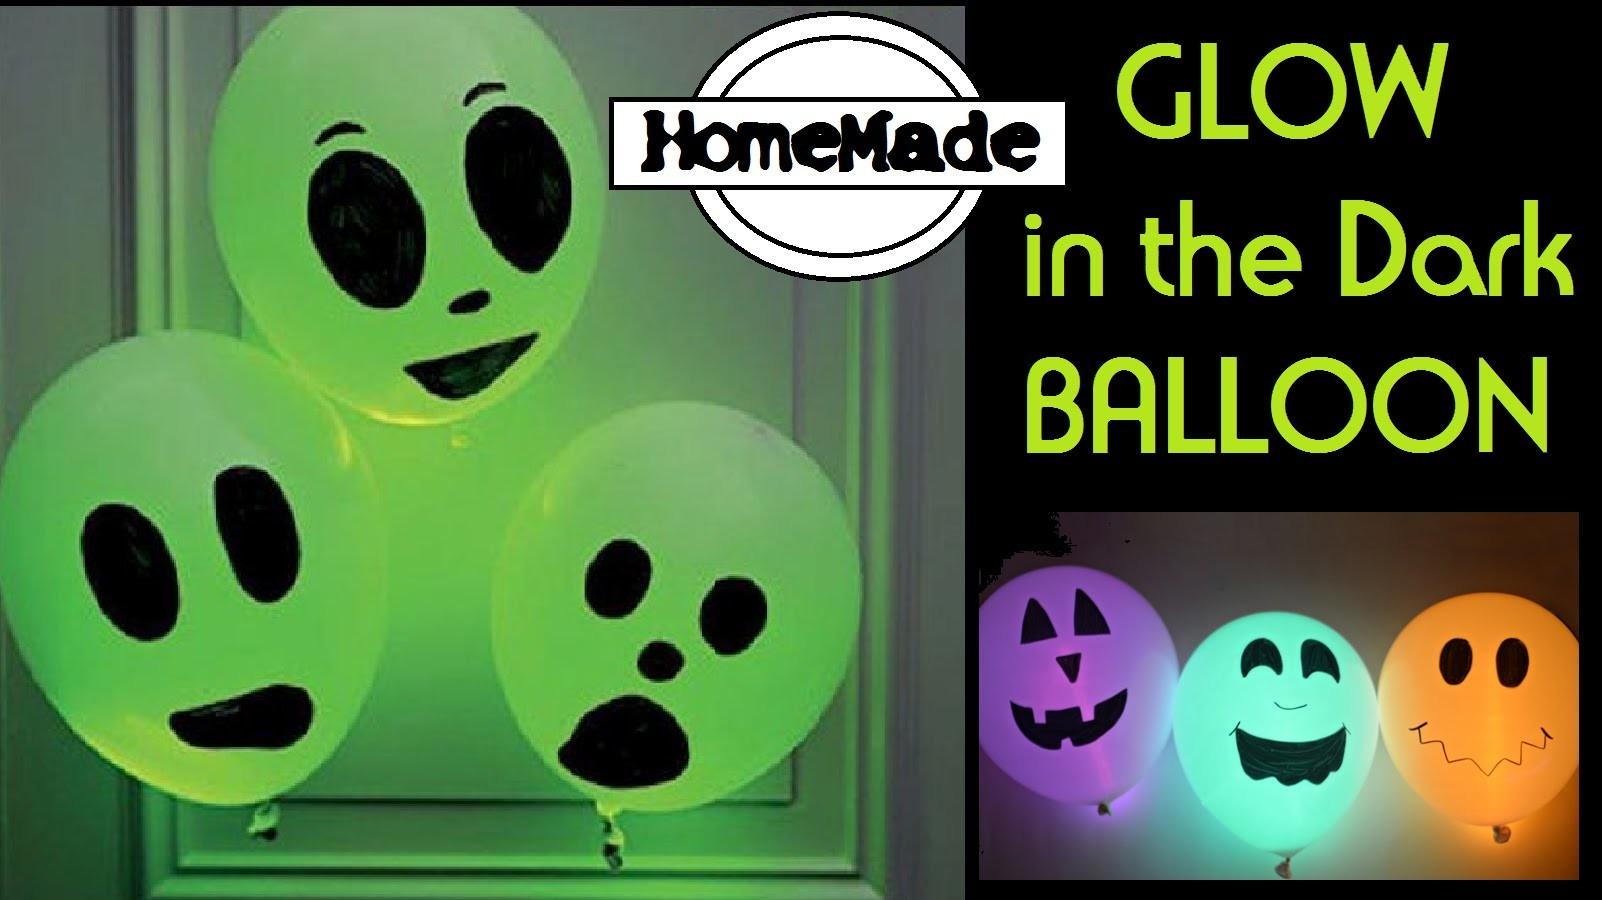 Glow in the dark Balloon! - DIY Halloween Party Ideas